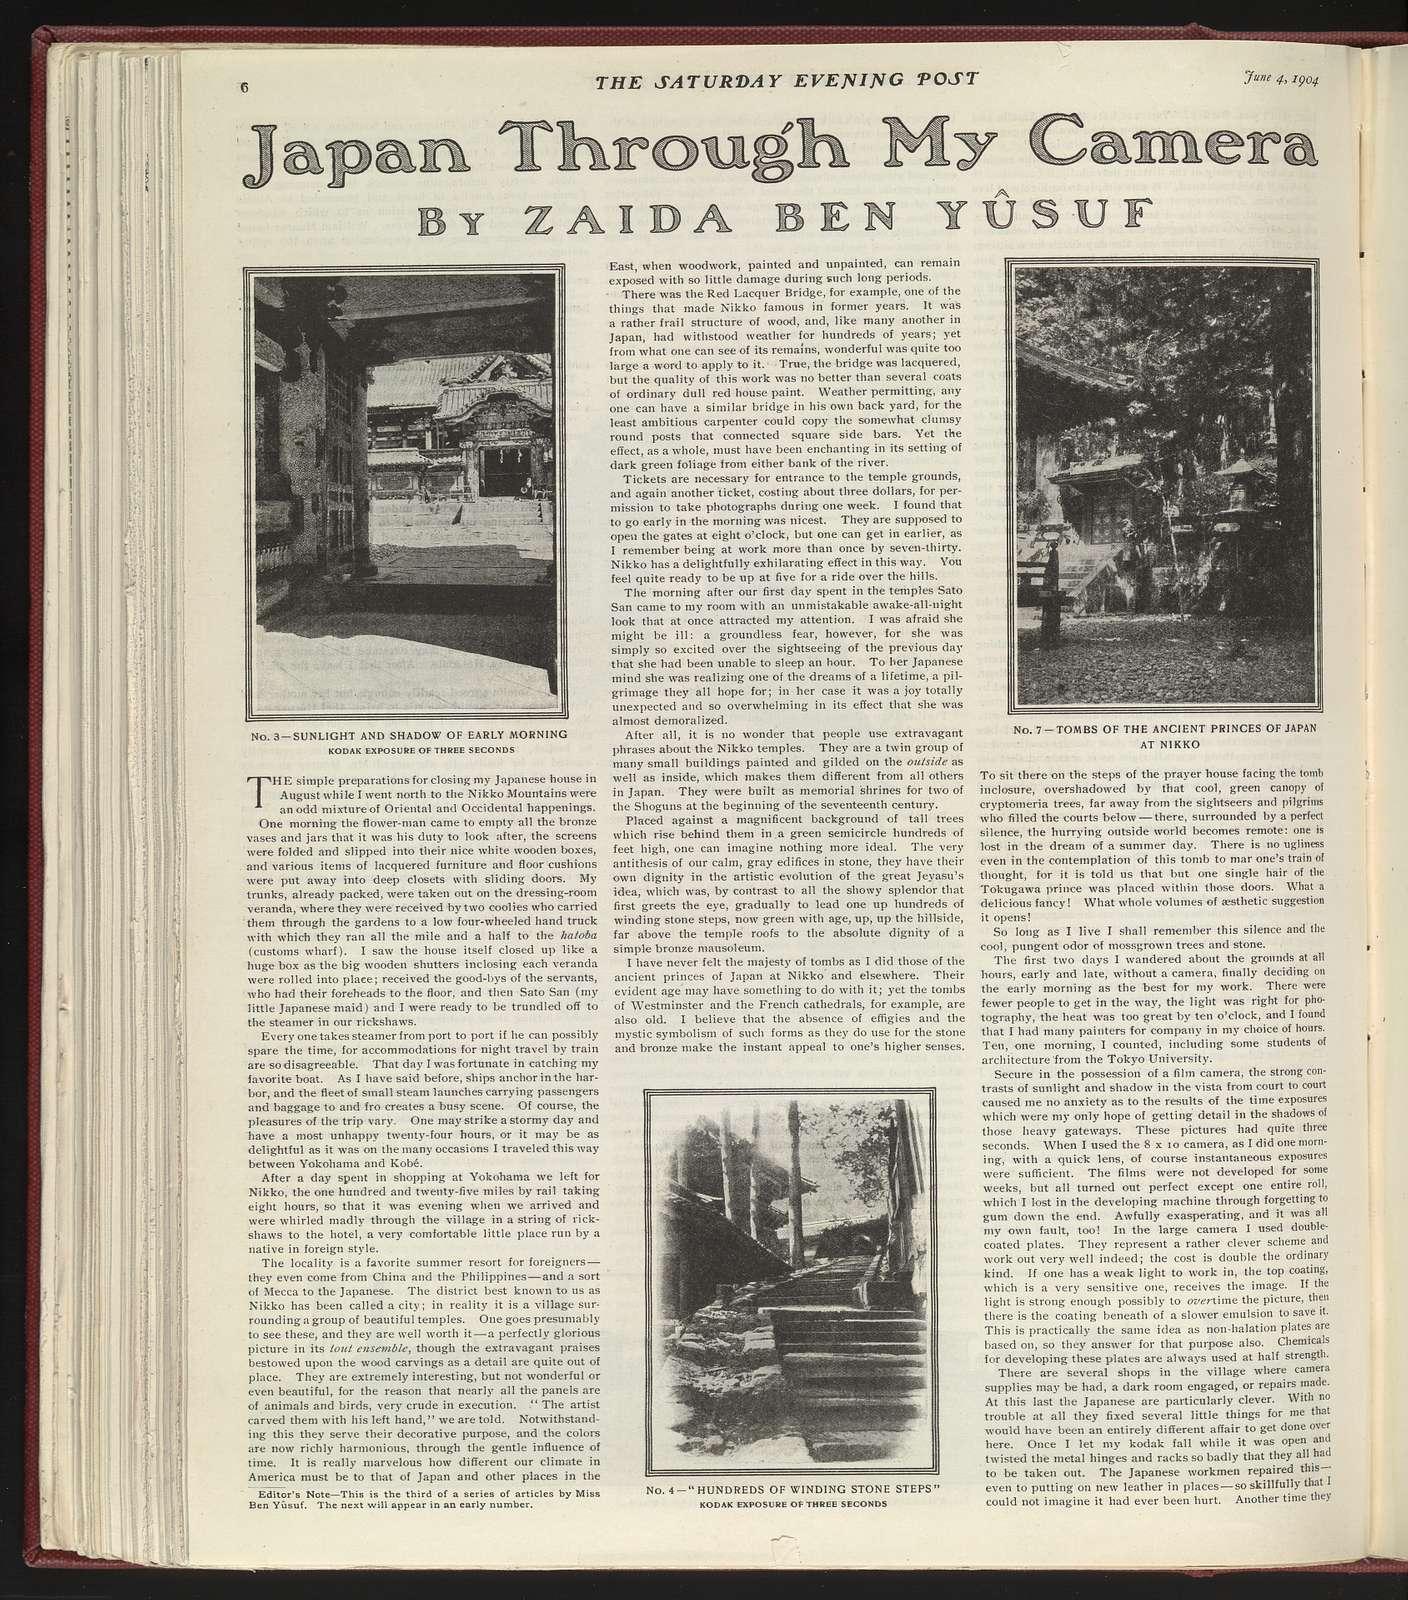 Japan through my camera / By Zaida Ben-Yûsuf.